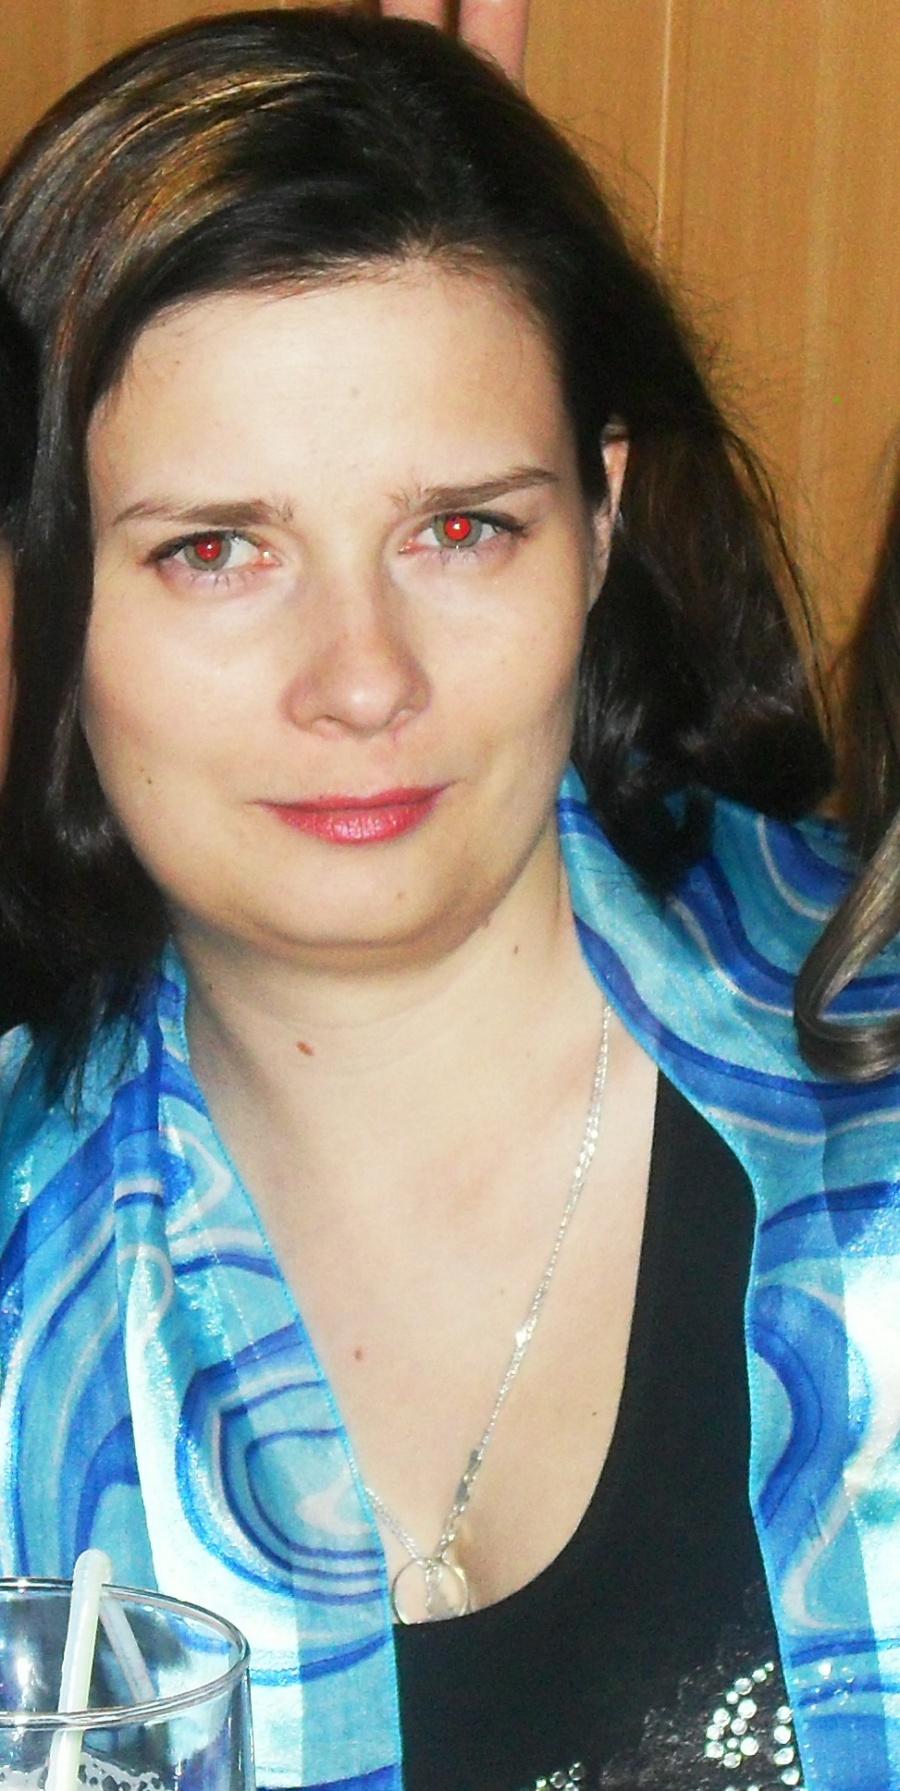 знакомства в прокопьевске с фото